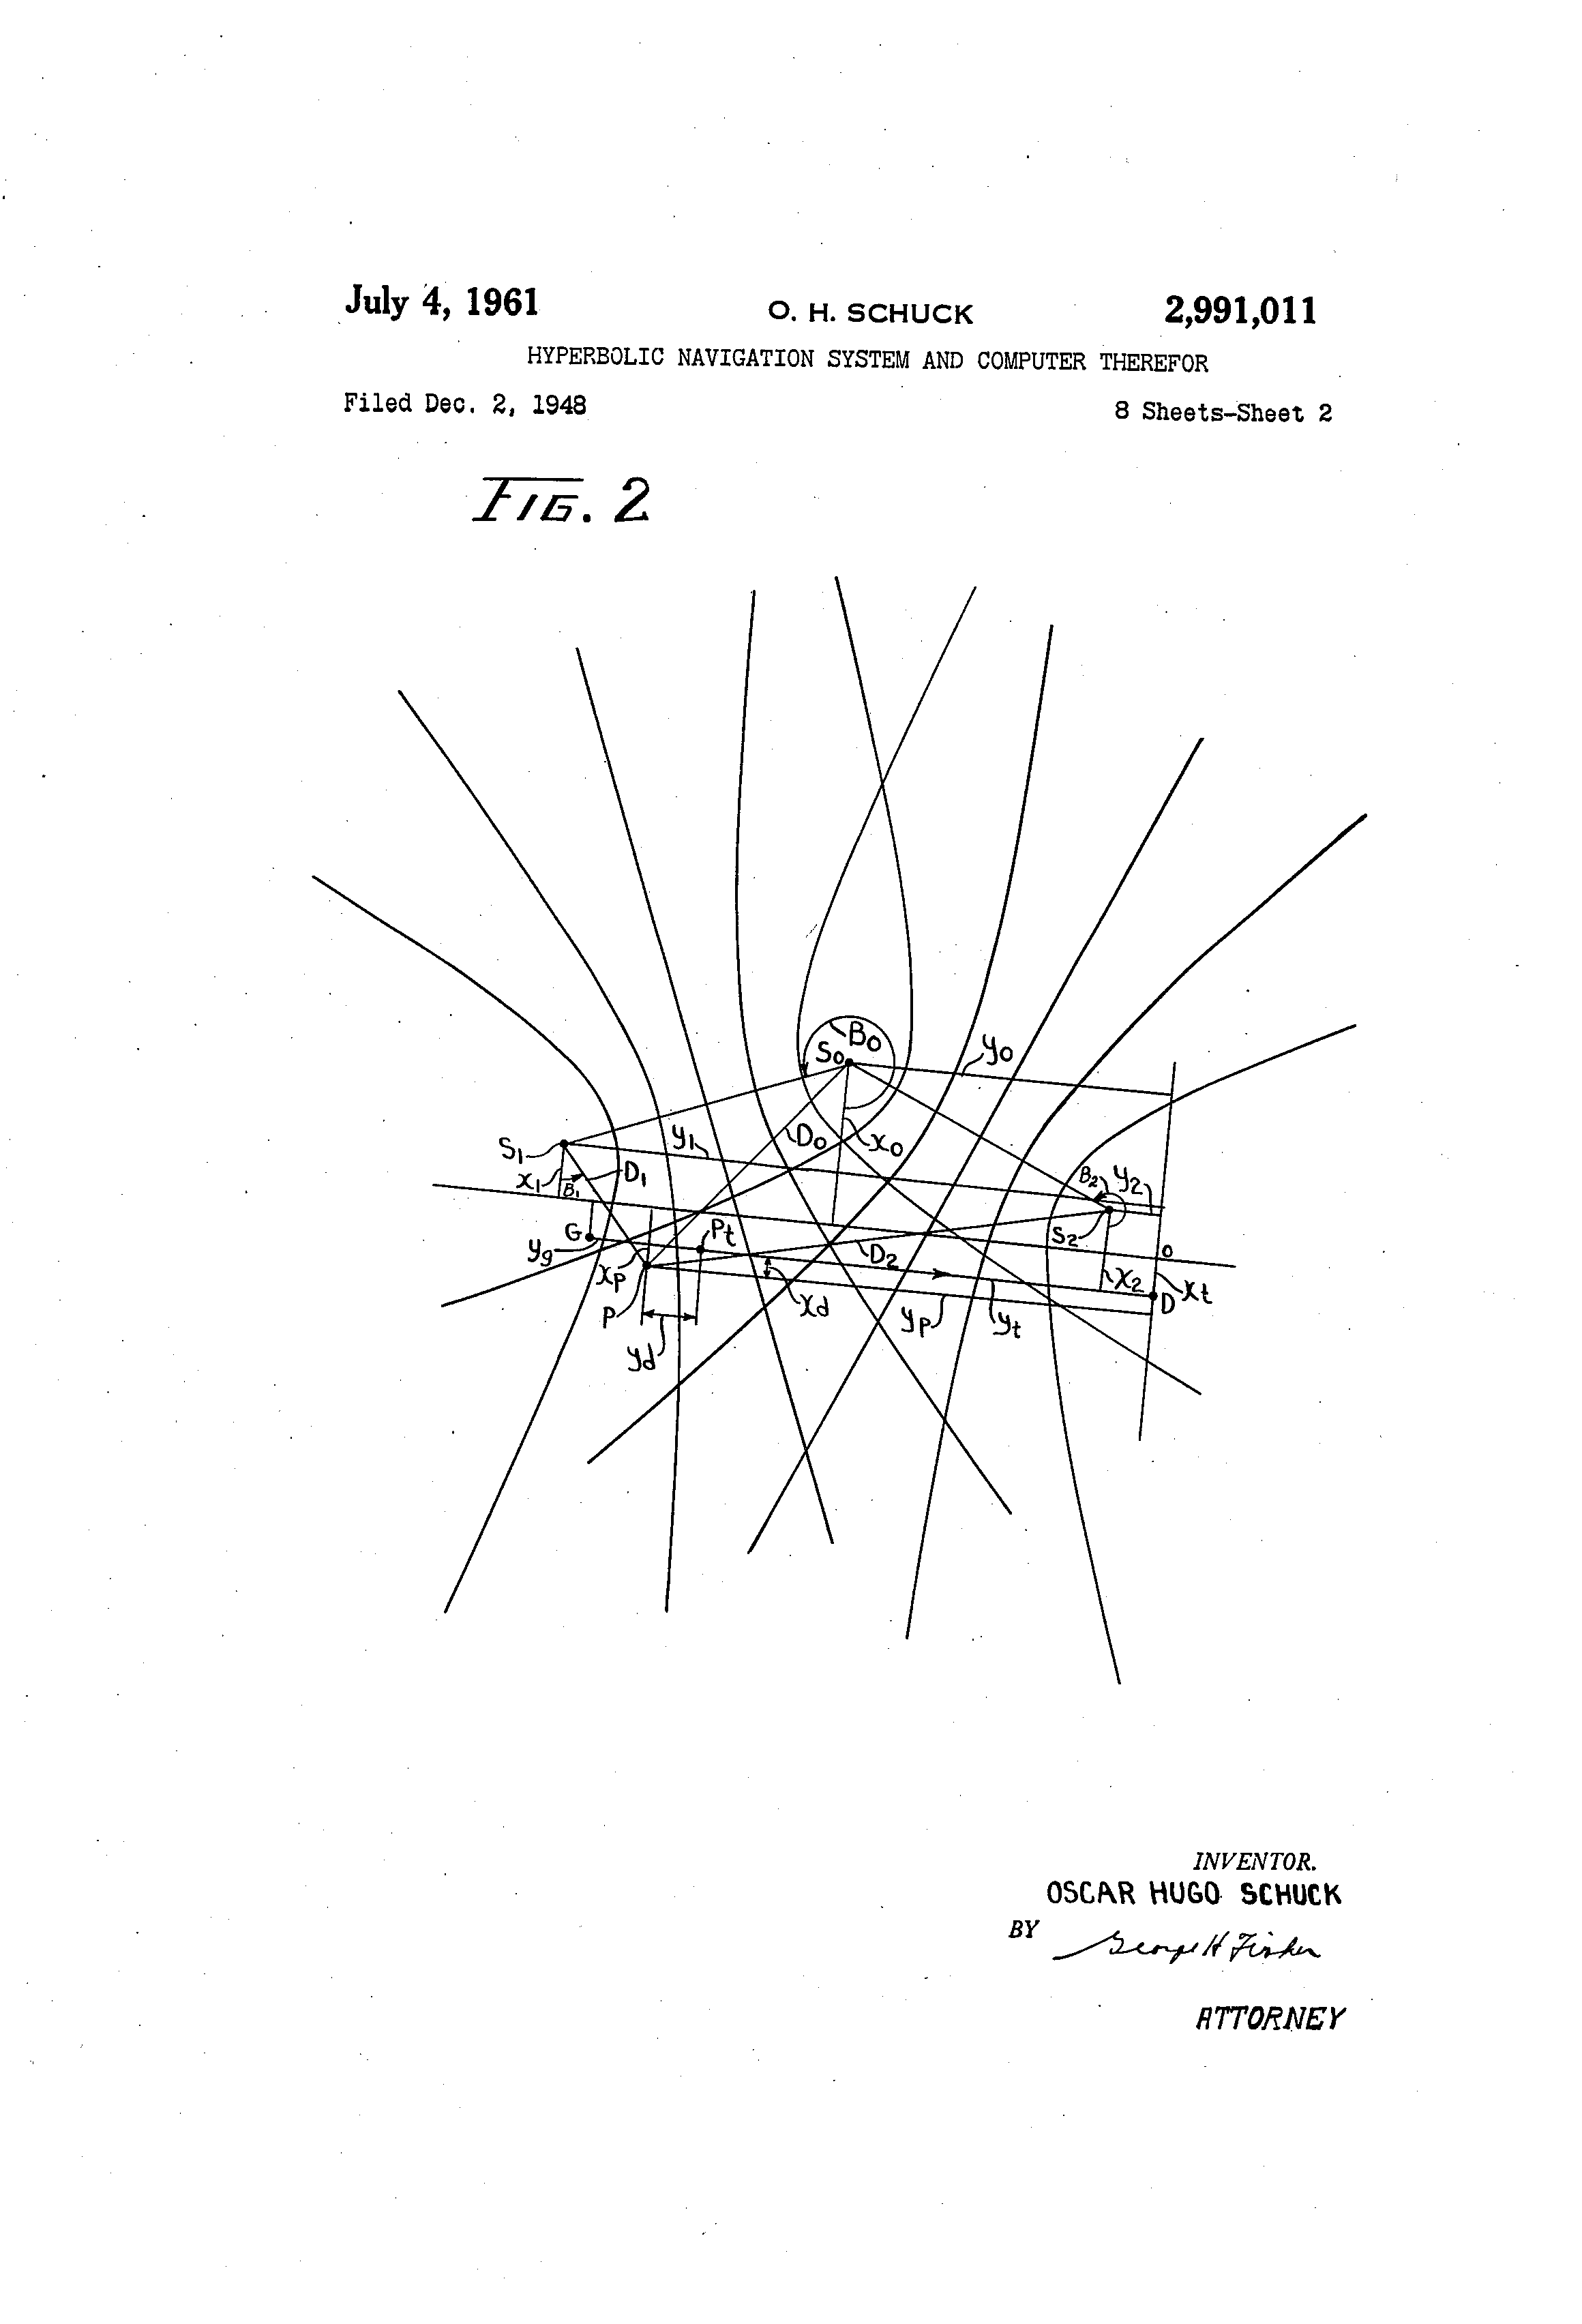 img6-hiperolic-nav-patent-US2991011-1